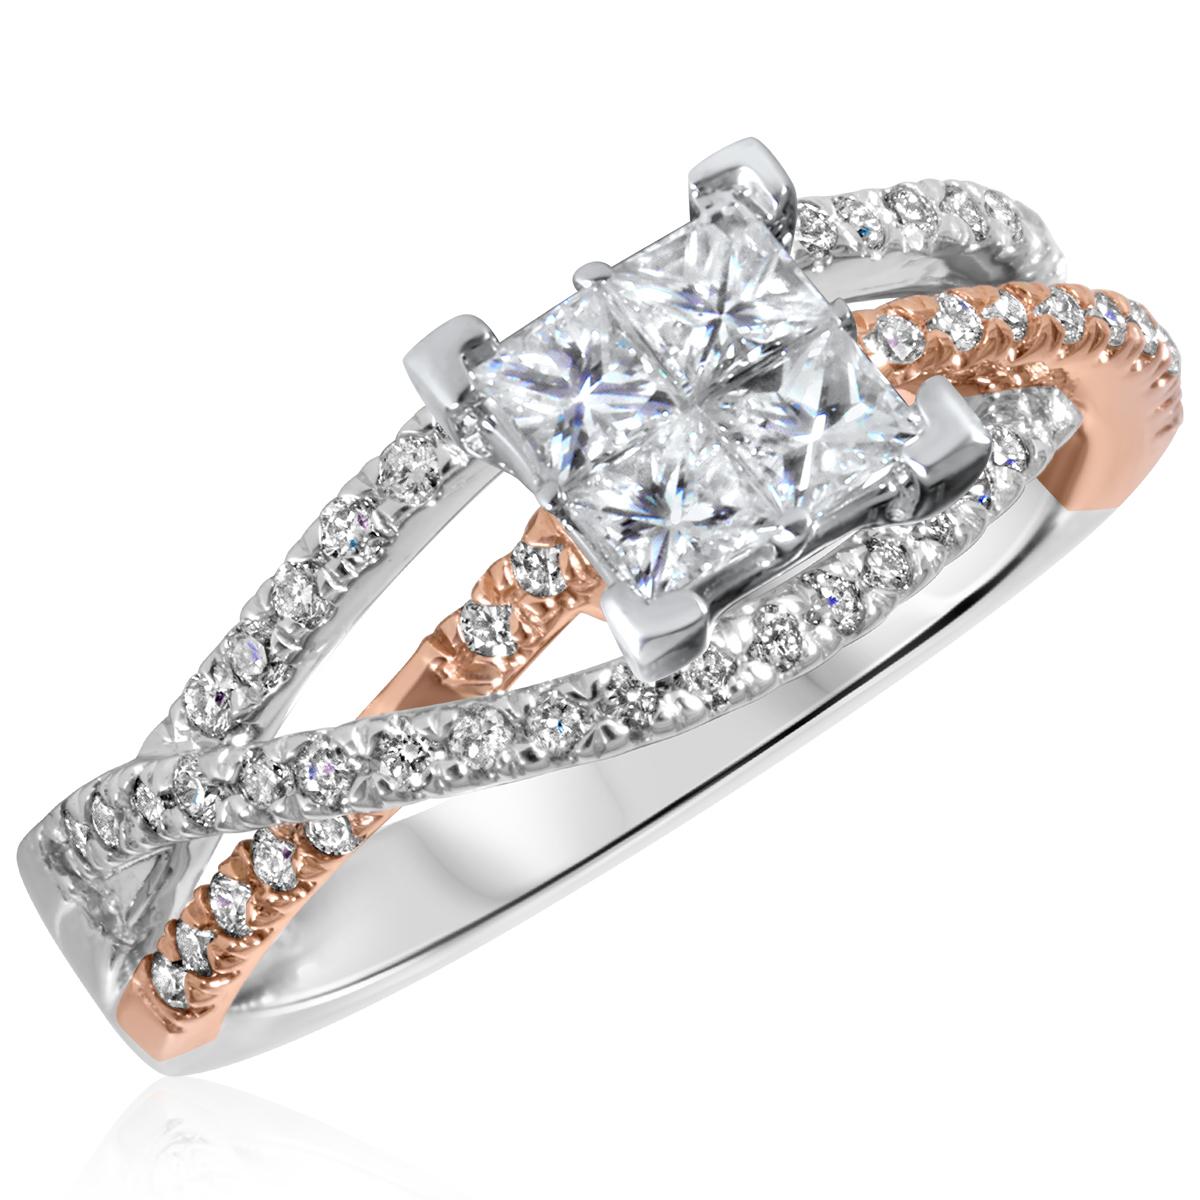 7/8 CT. T.W. Diamond Ladies Engagement Ring 14K White Gold- Size 8